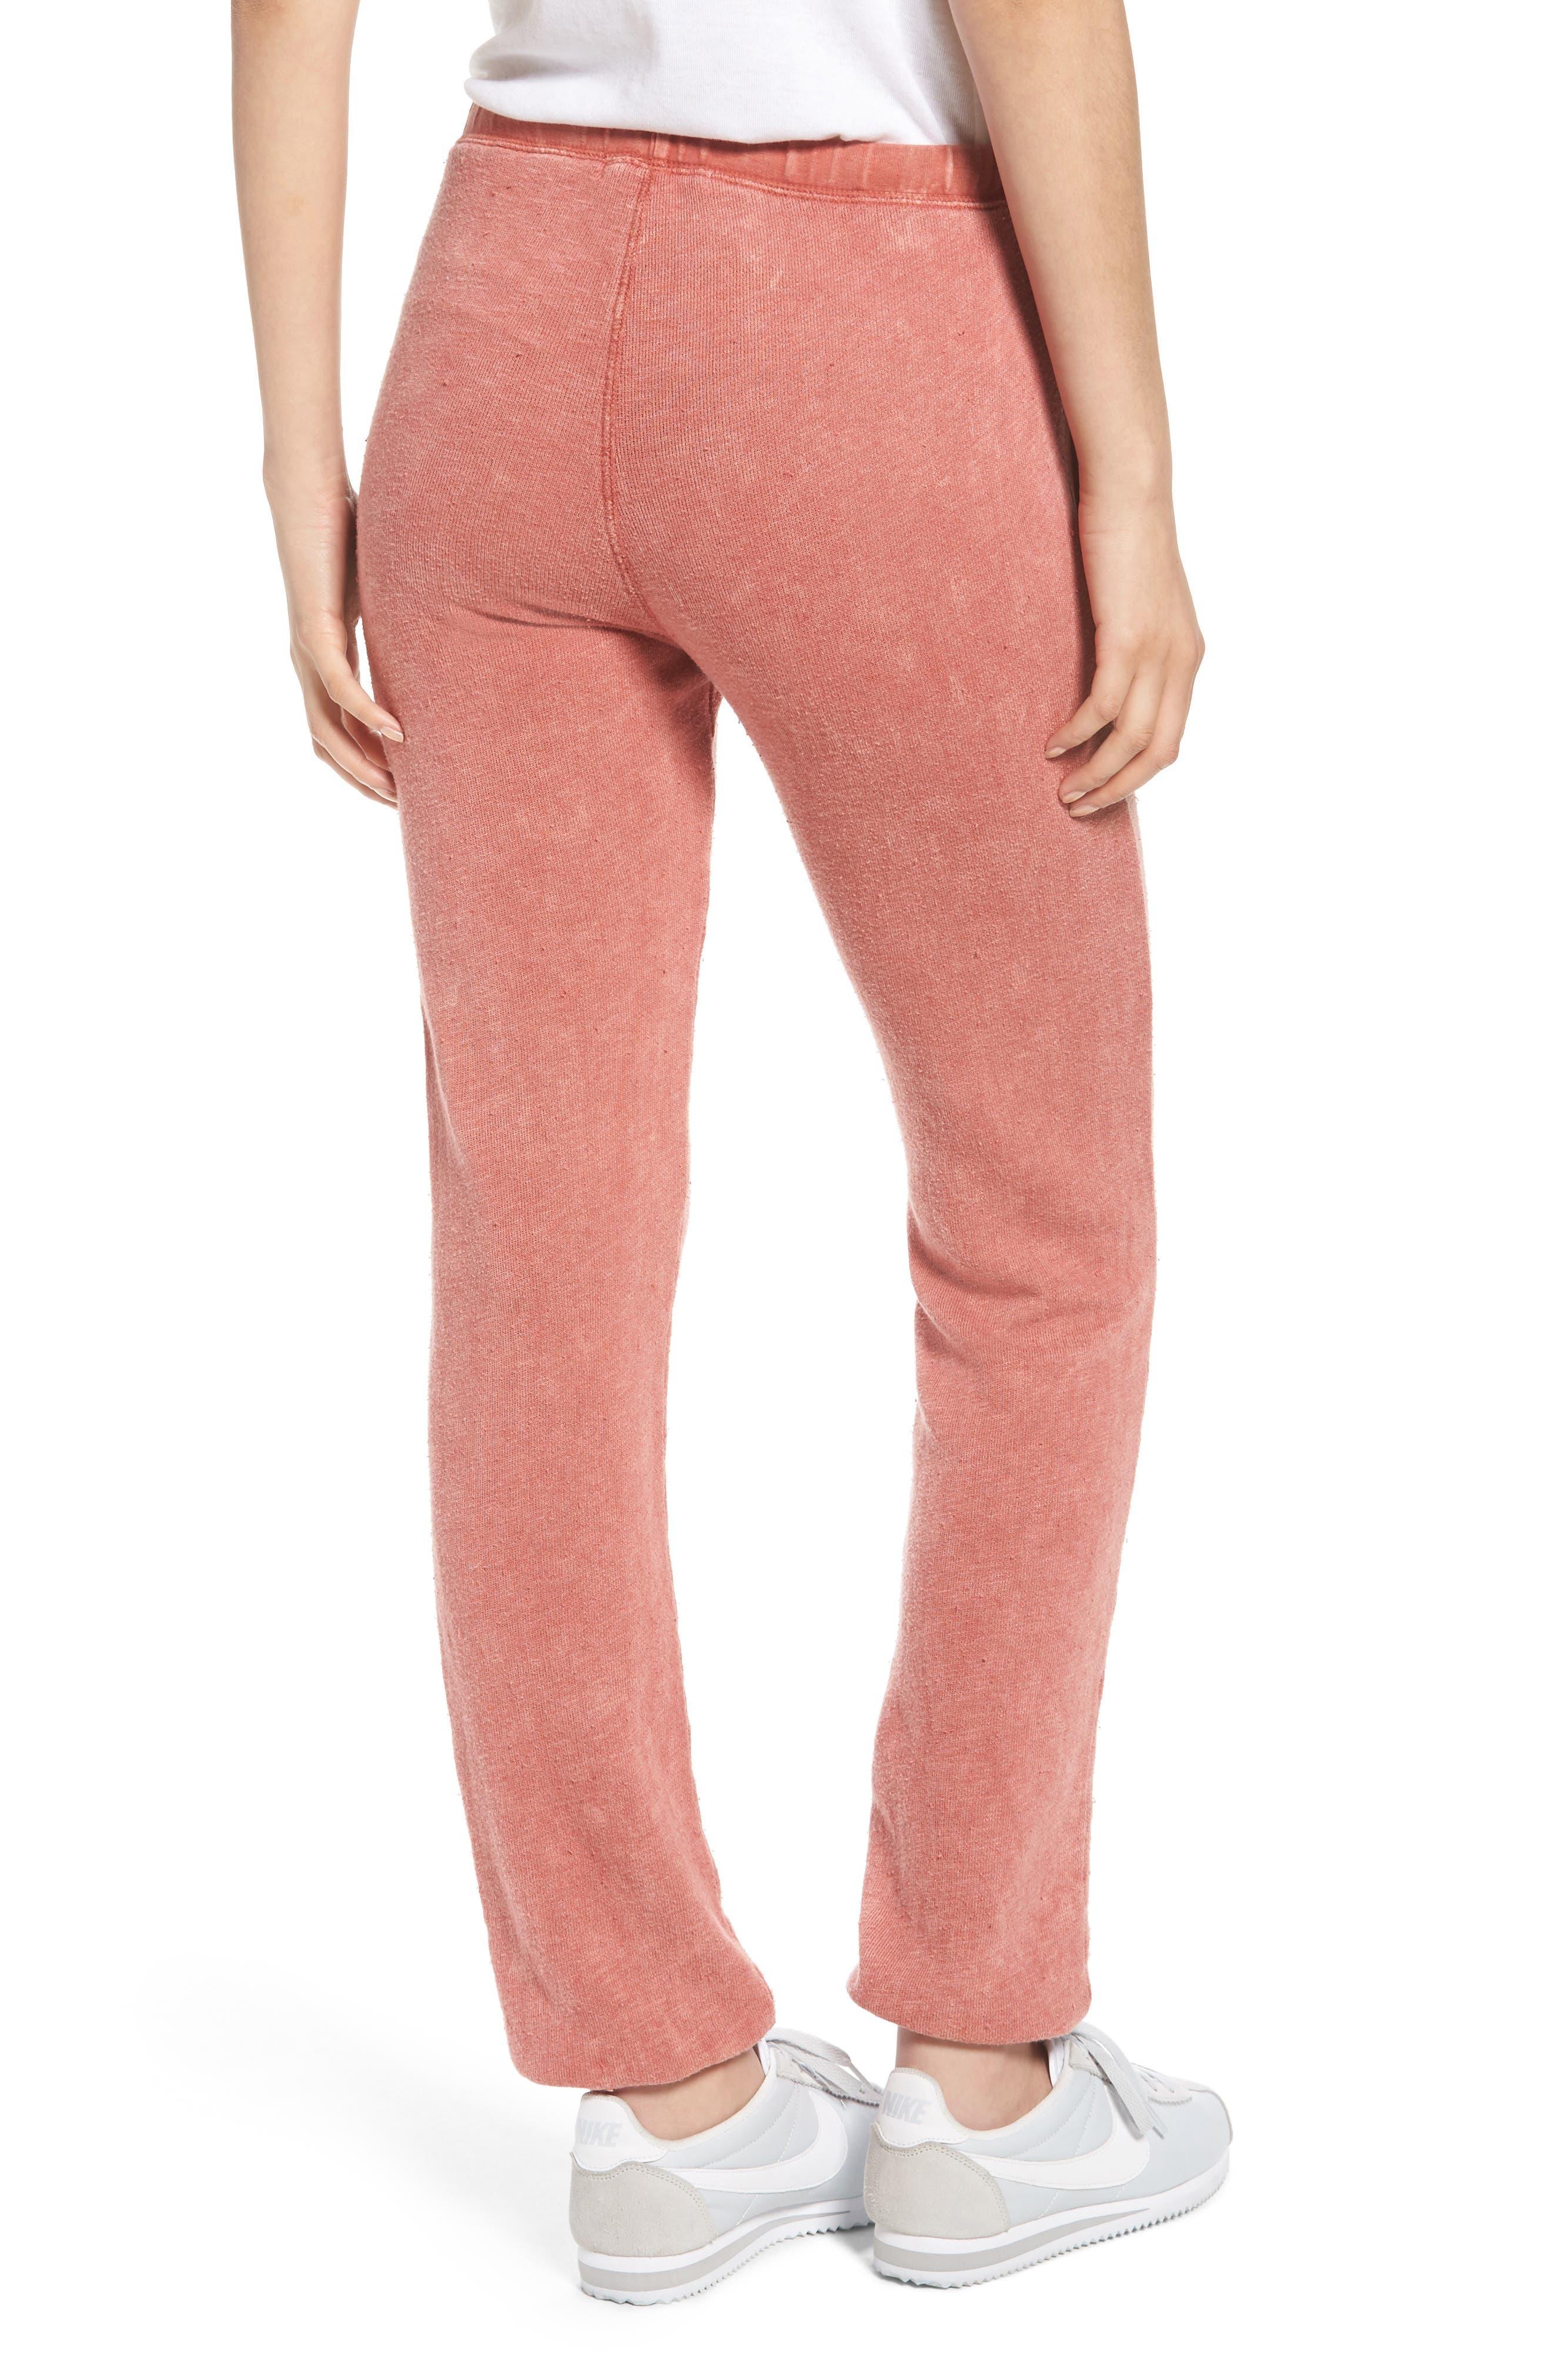 Kiama Lounge Pants,                             Alternate thumbnail 4, color,